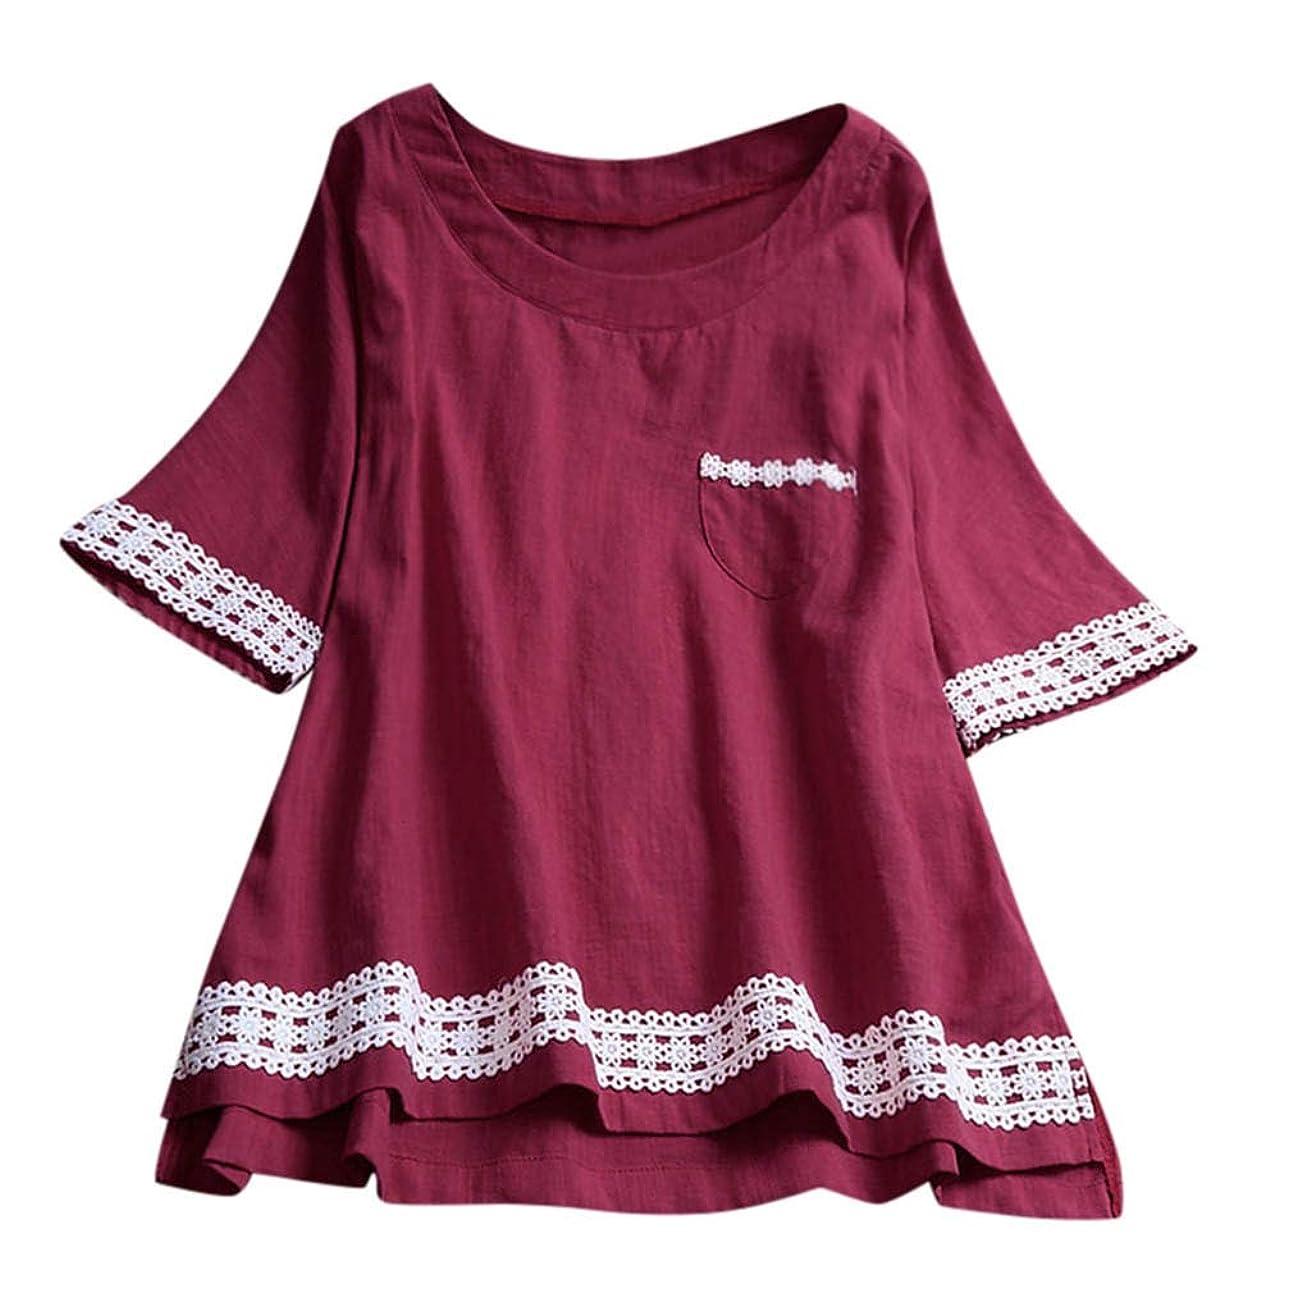 Miuye Womens Blouse Casual Plus Size T-Shirt Loose Button-Down Tunic Tops Tee Print Dress